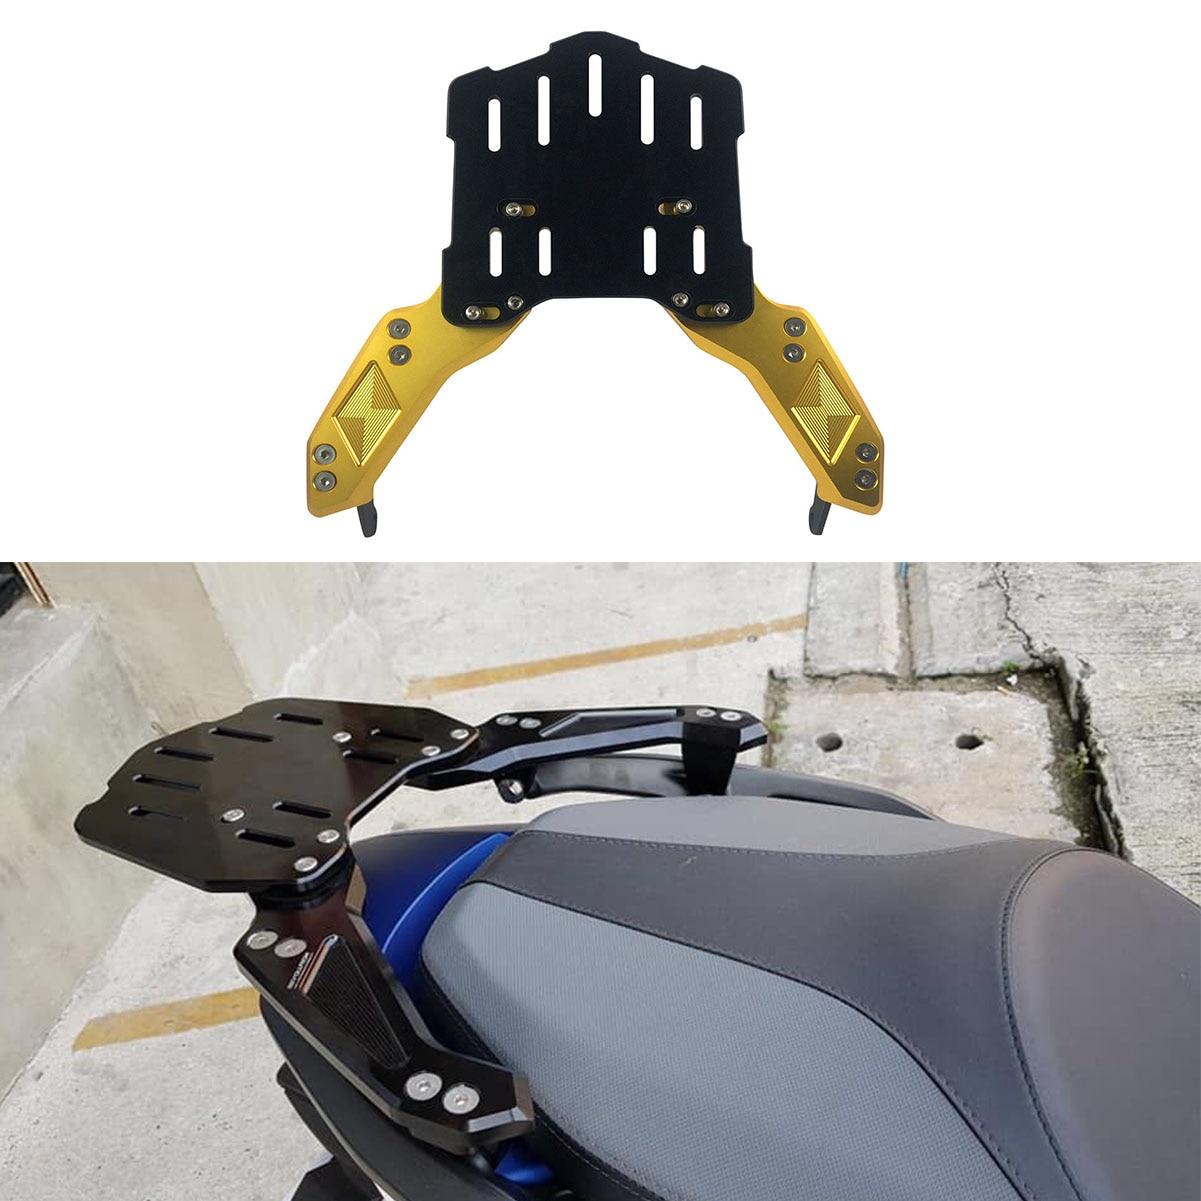 Volhardend Cnc Motorfiets Achter Bagage Beugel Voor Honda Forza 300 125 250 2018 2019 Staart Rack Top Box Case Koffer Beugel Carrier Board